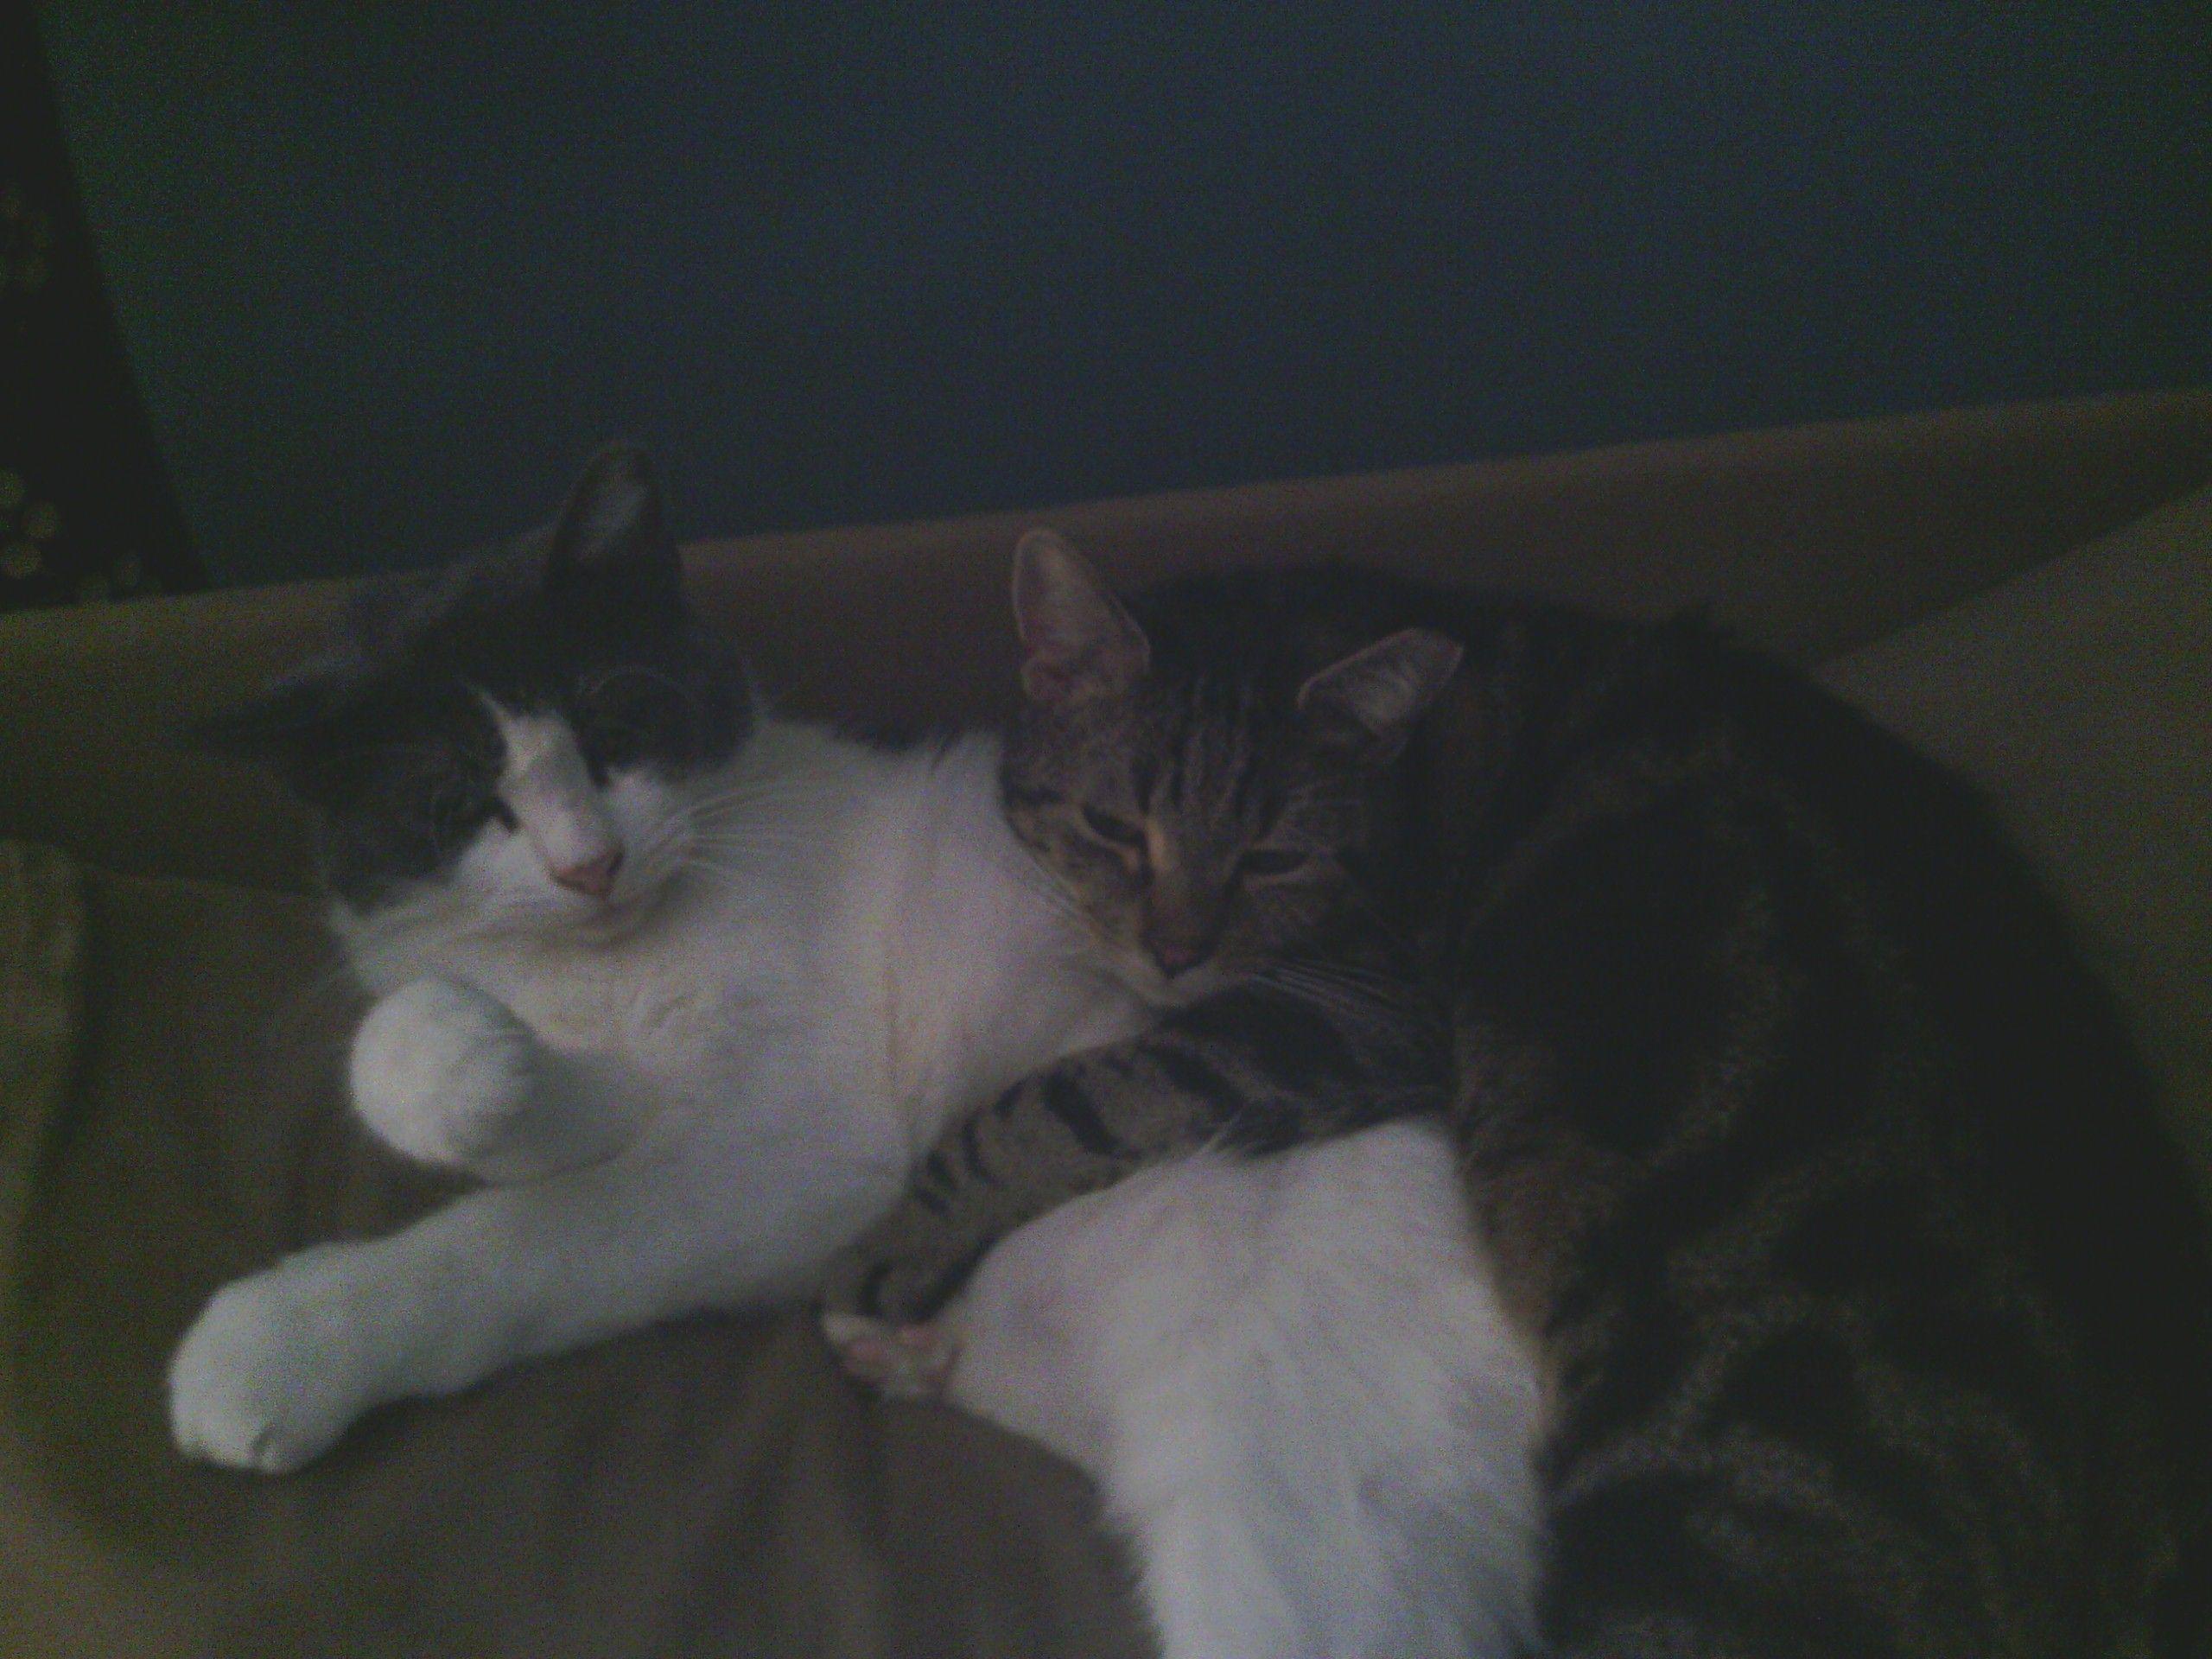 Cuddly nap time!